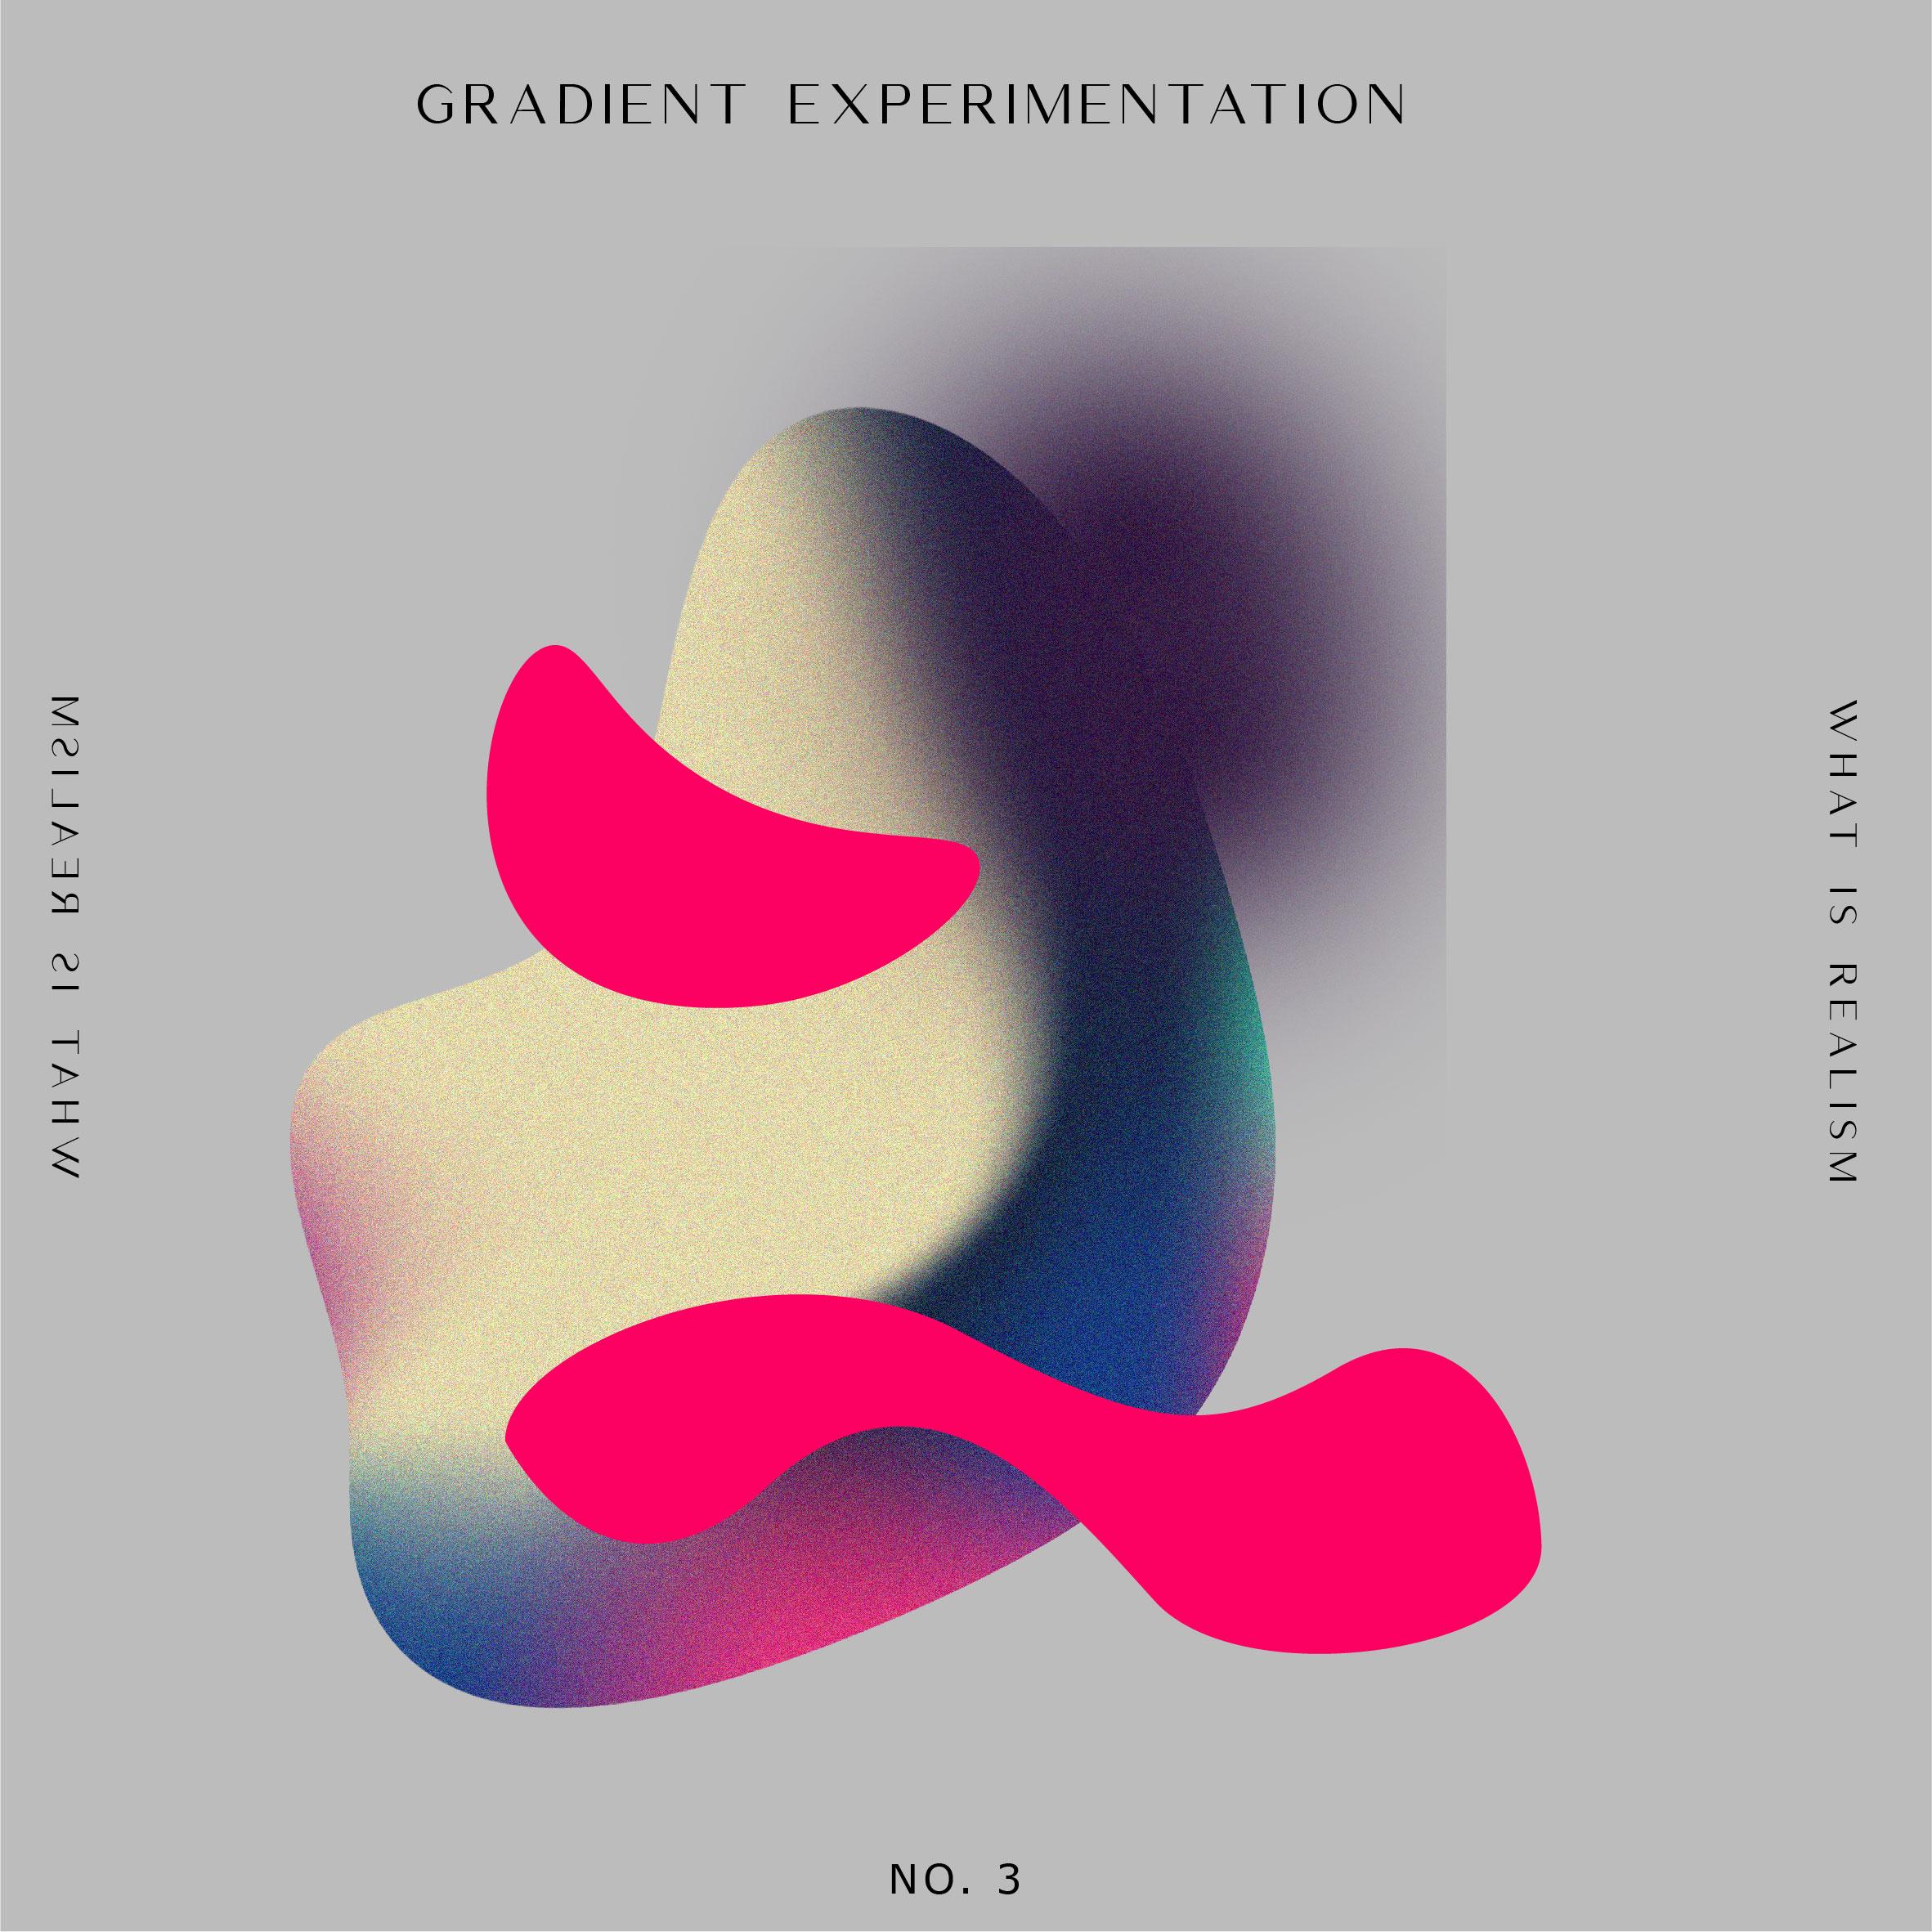 gradient experimentation 2-02.jpg